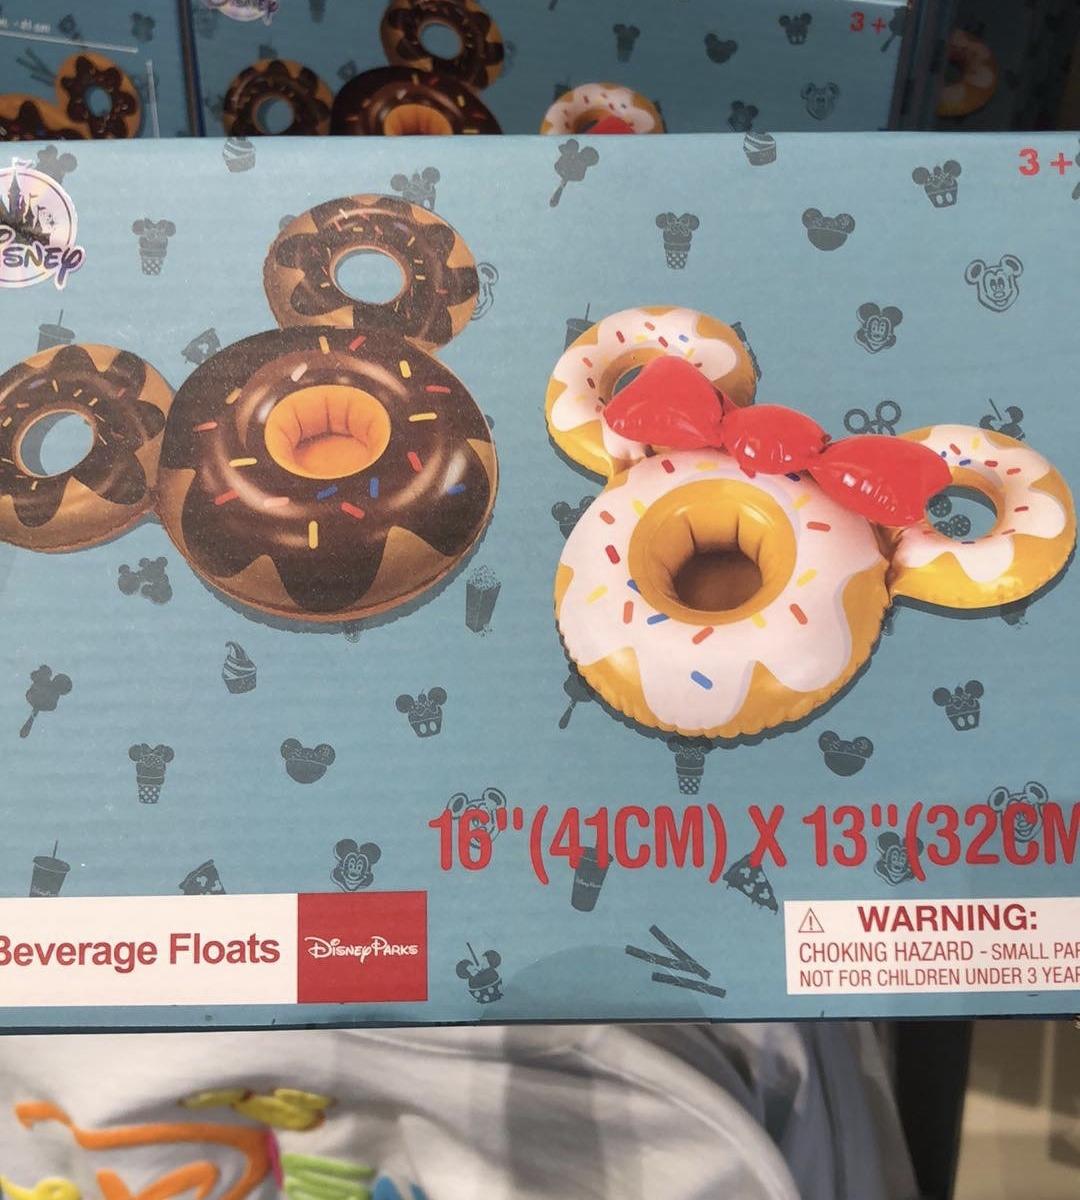 Disney Donut Pool Floats at Disney Springs 2